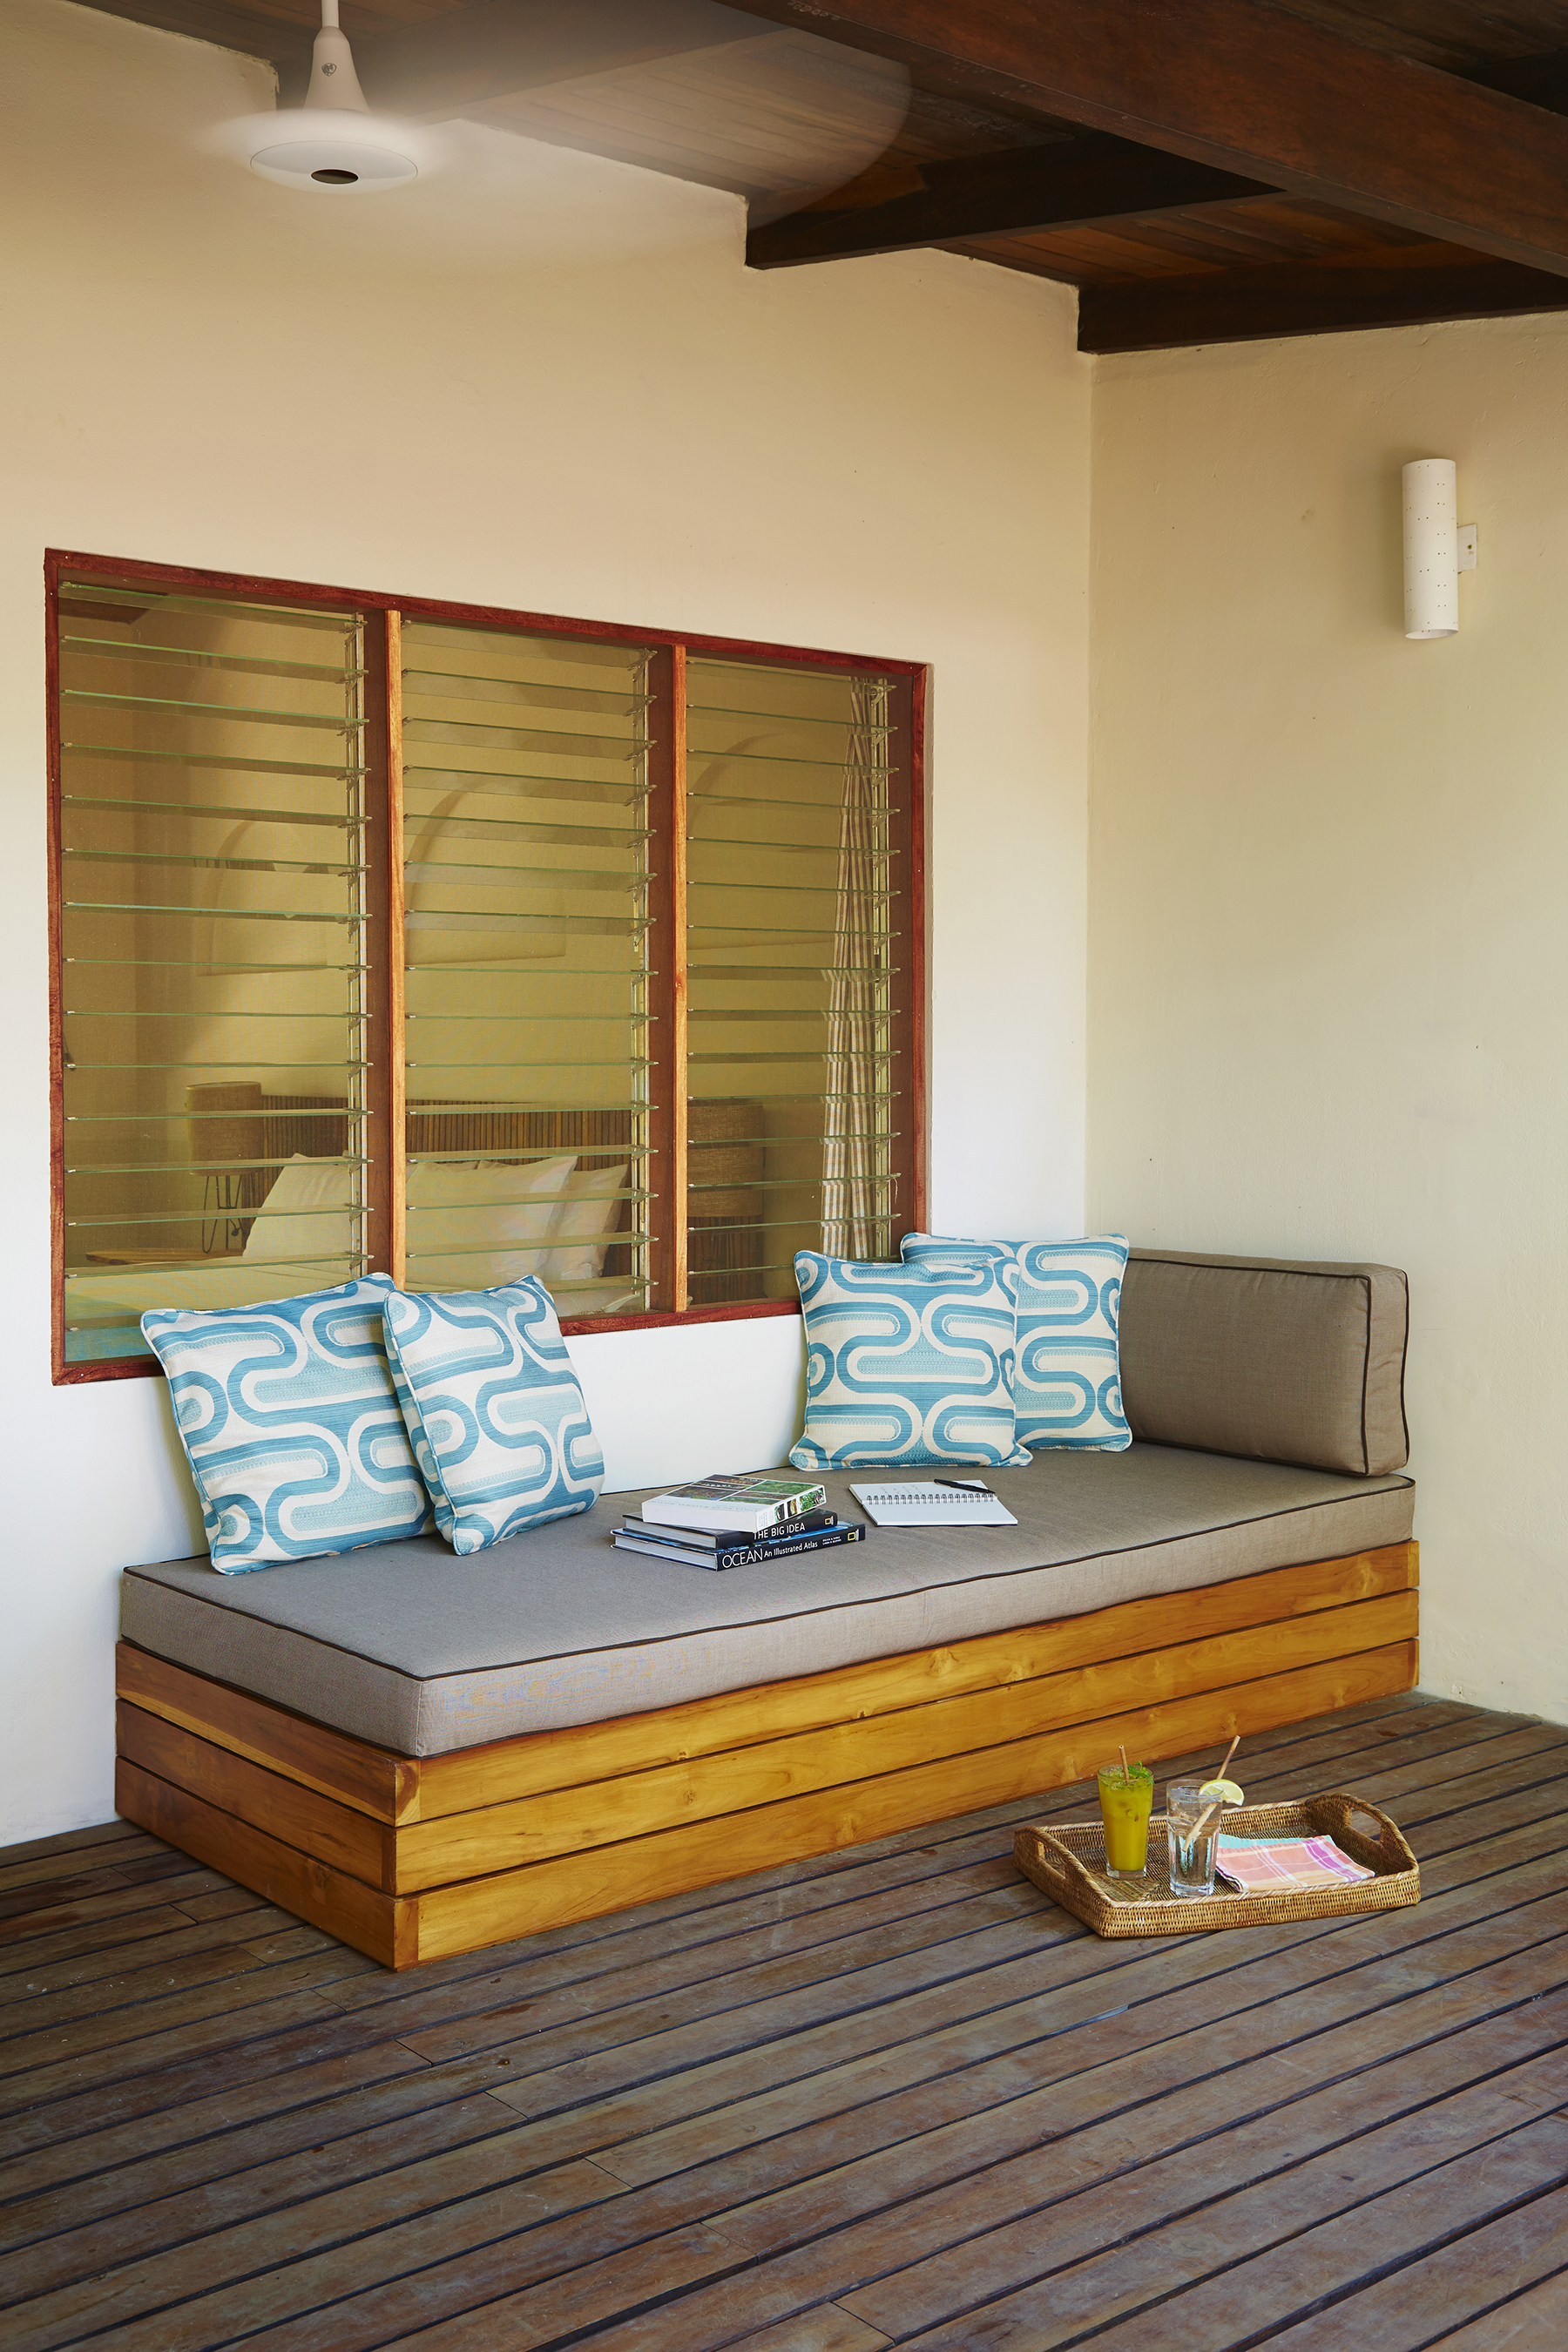 South_America_Costa_Rica_Nosara_Harmony_Hotel_Deck.jpg